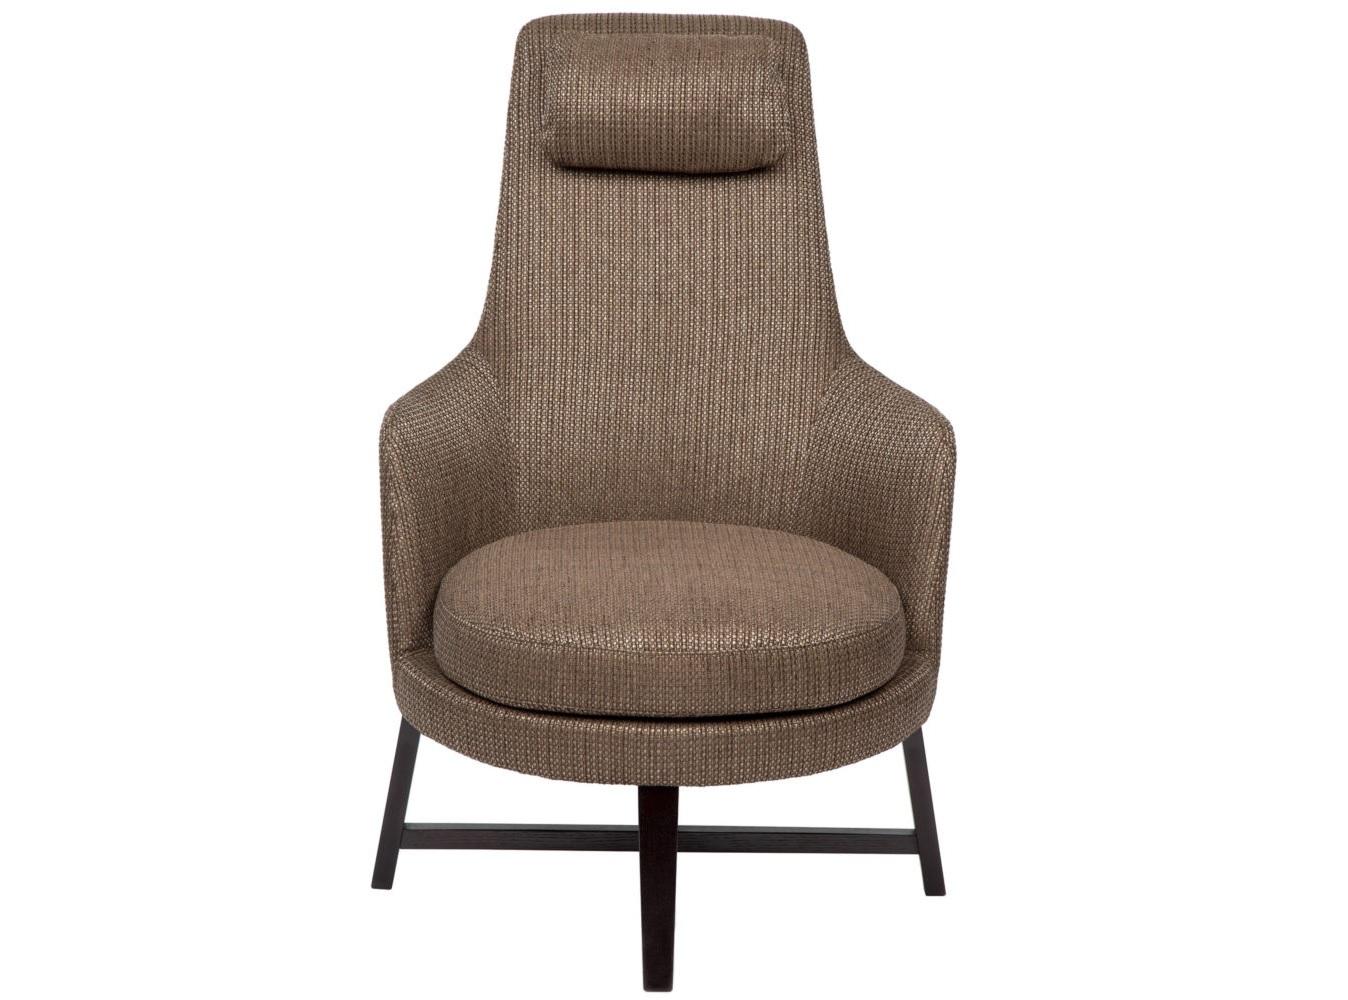 Кресло Home SpaceКресла с высокой спинкой<br><br><br>kit: None<br>gender: None